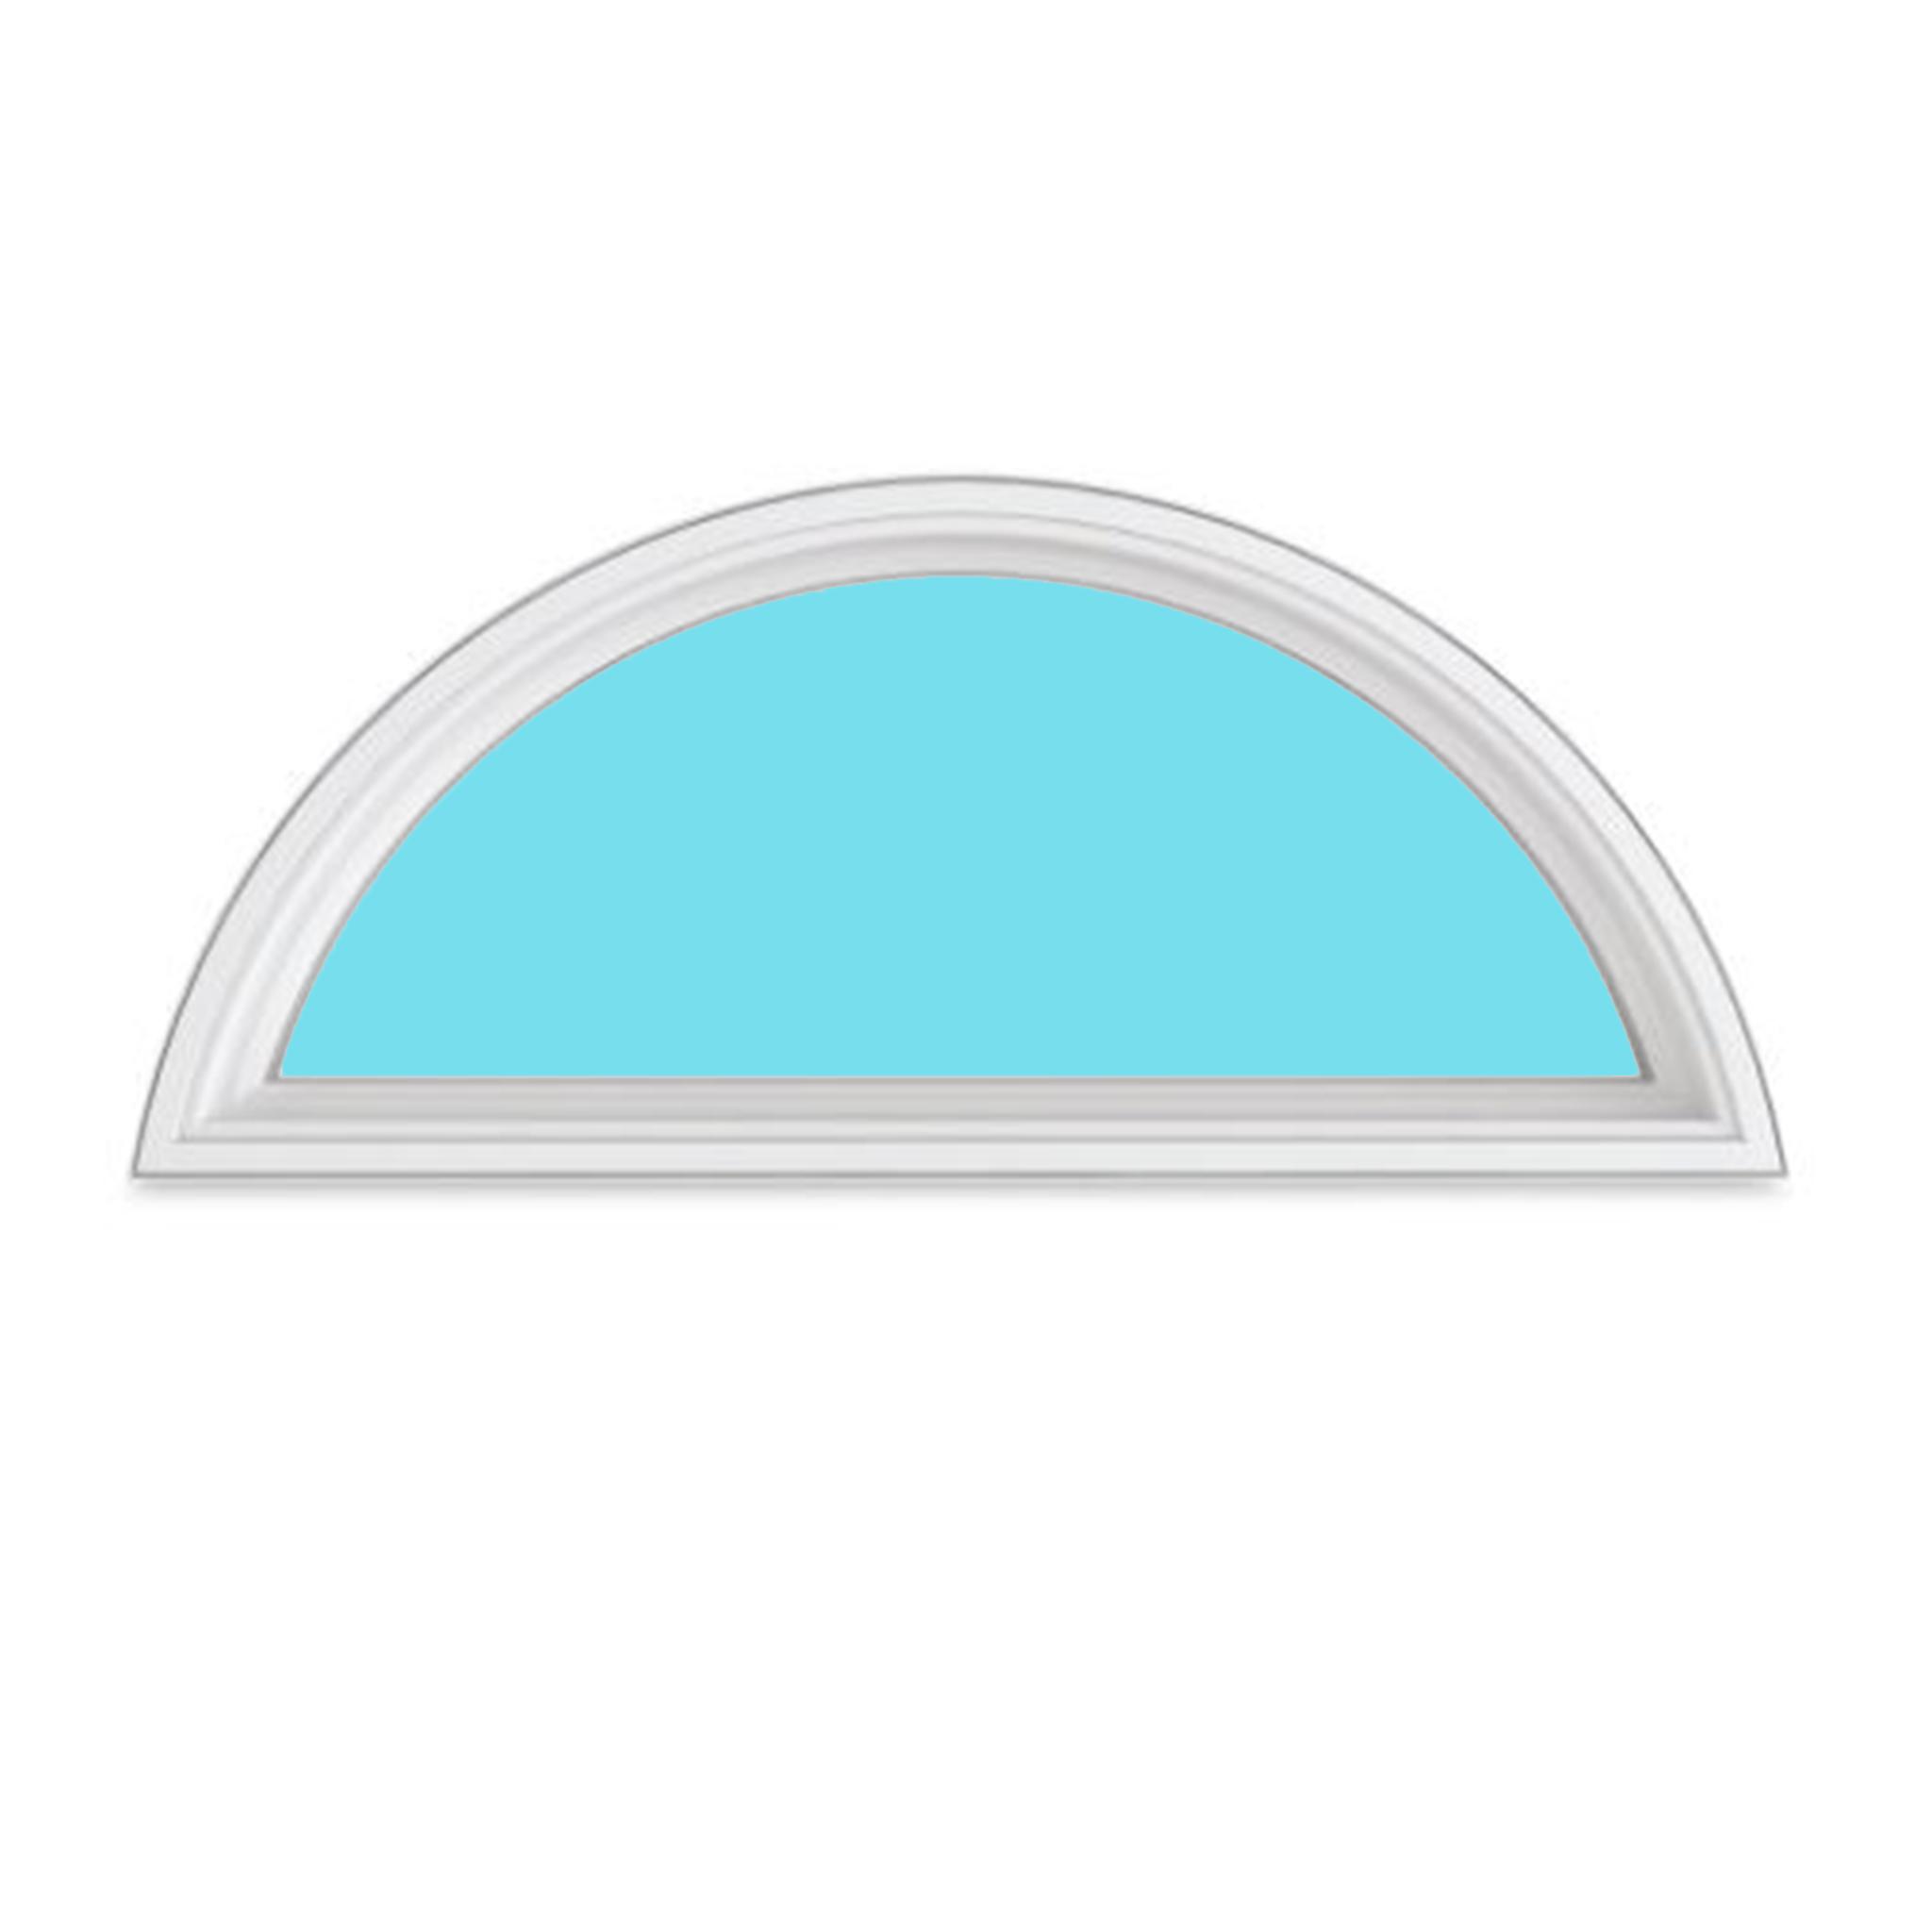 EYEBROW ARCH Image